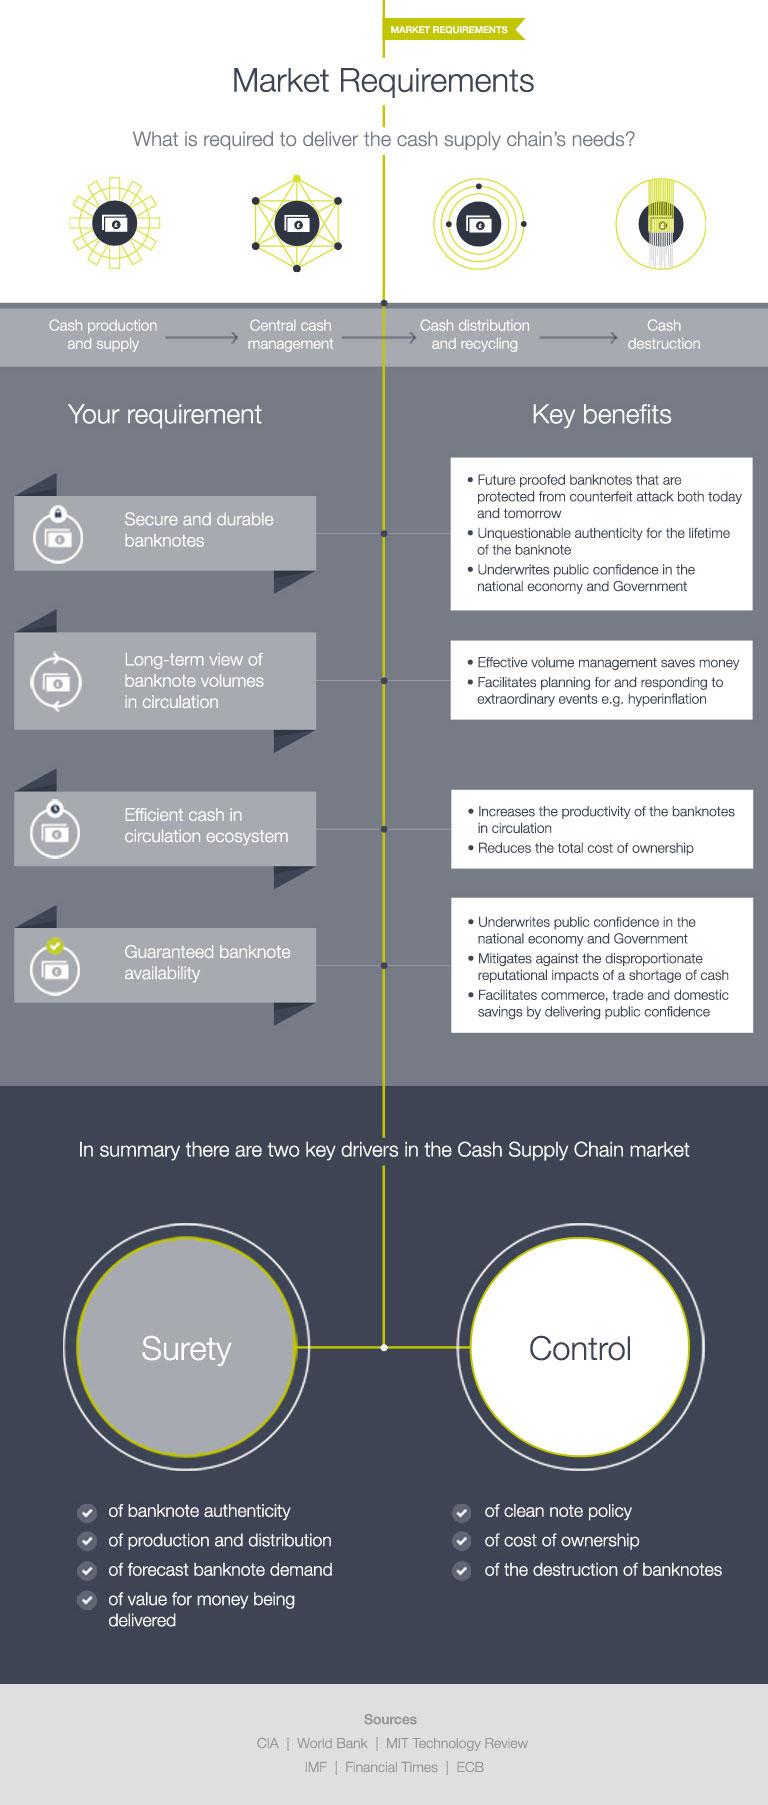 Core customer needs and benefits